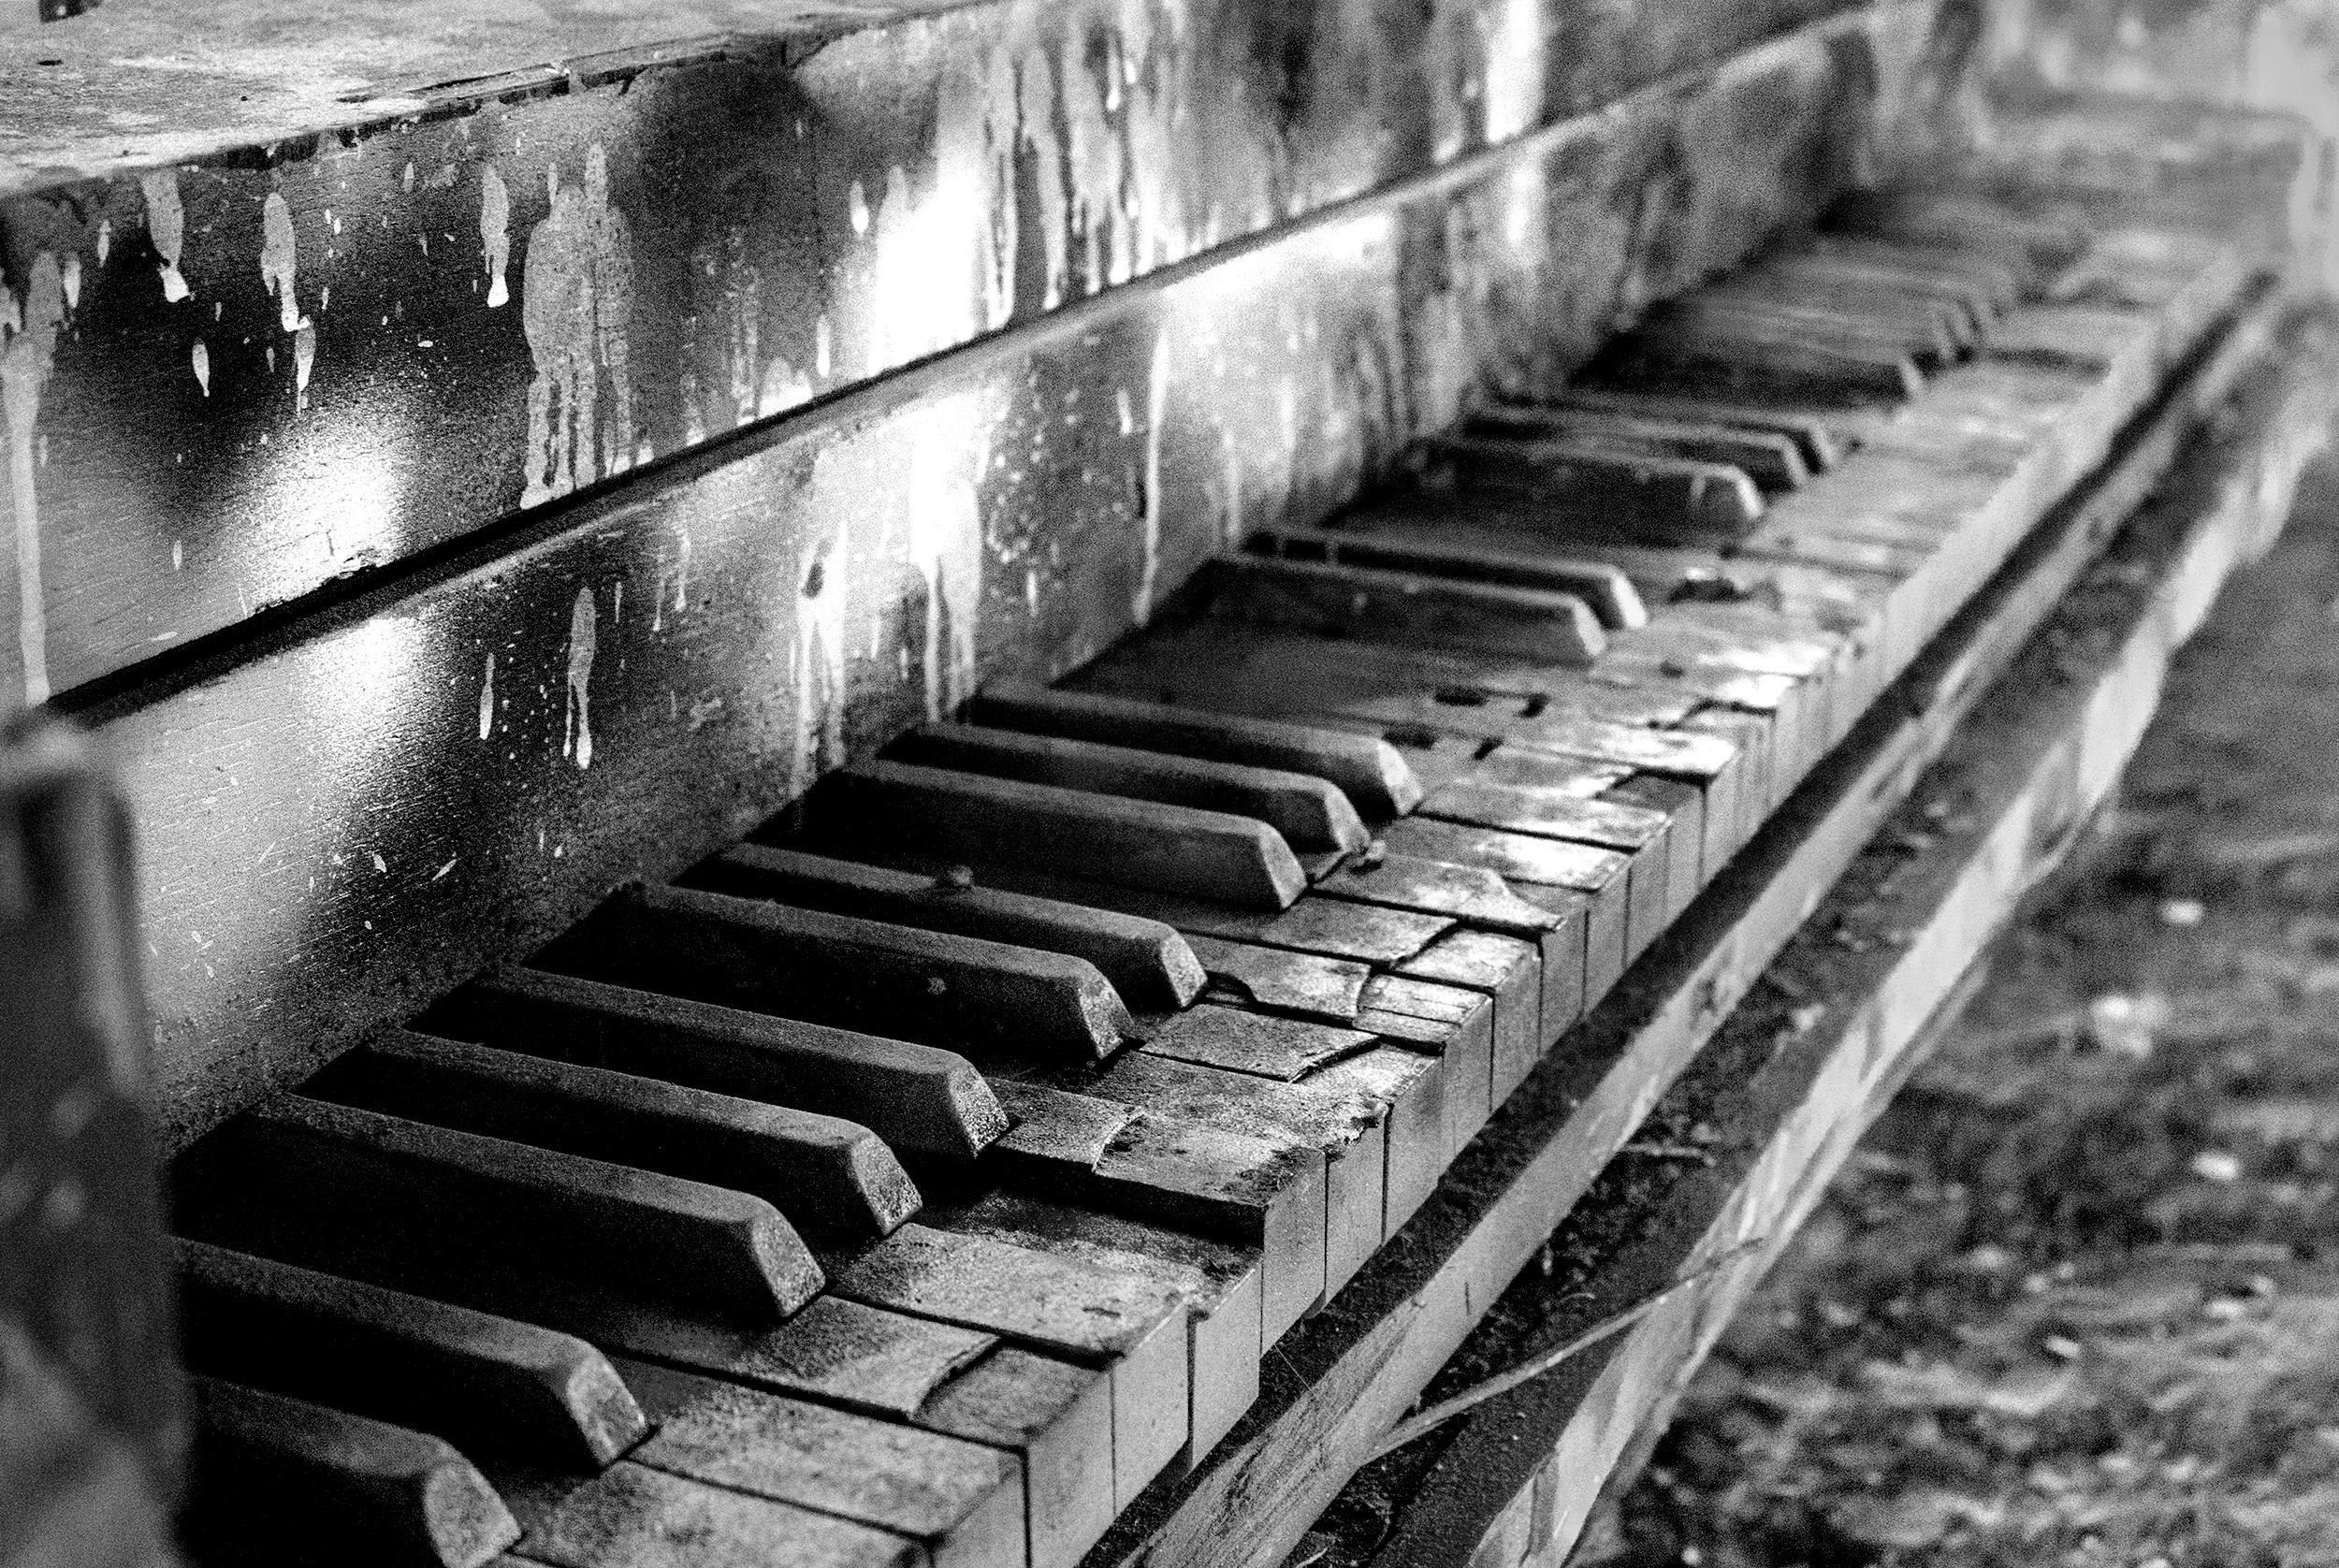 PianoDecay(BlackandWhite)WEBSITE.jpg